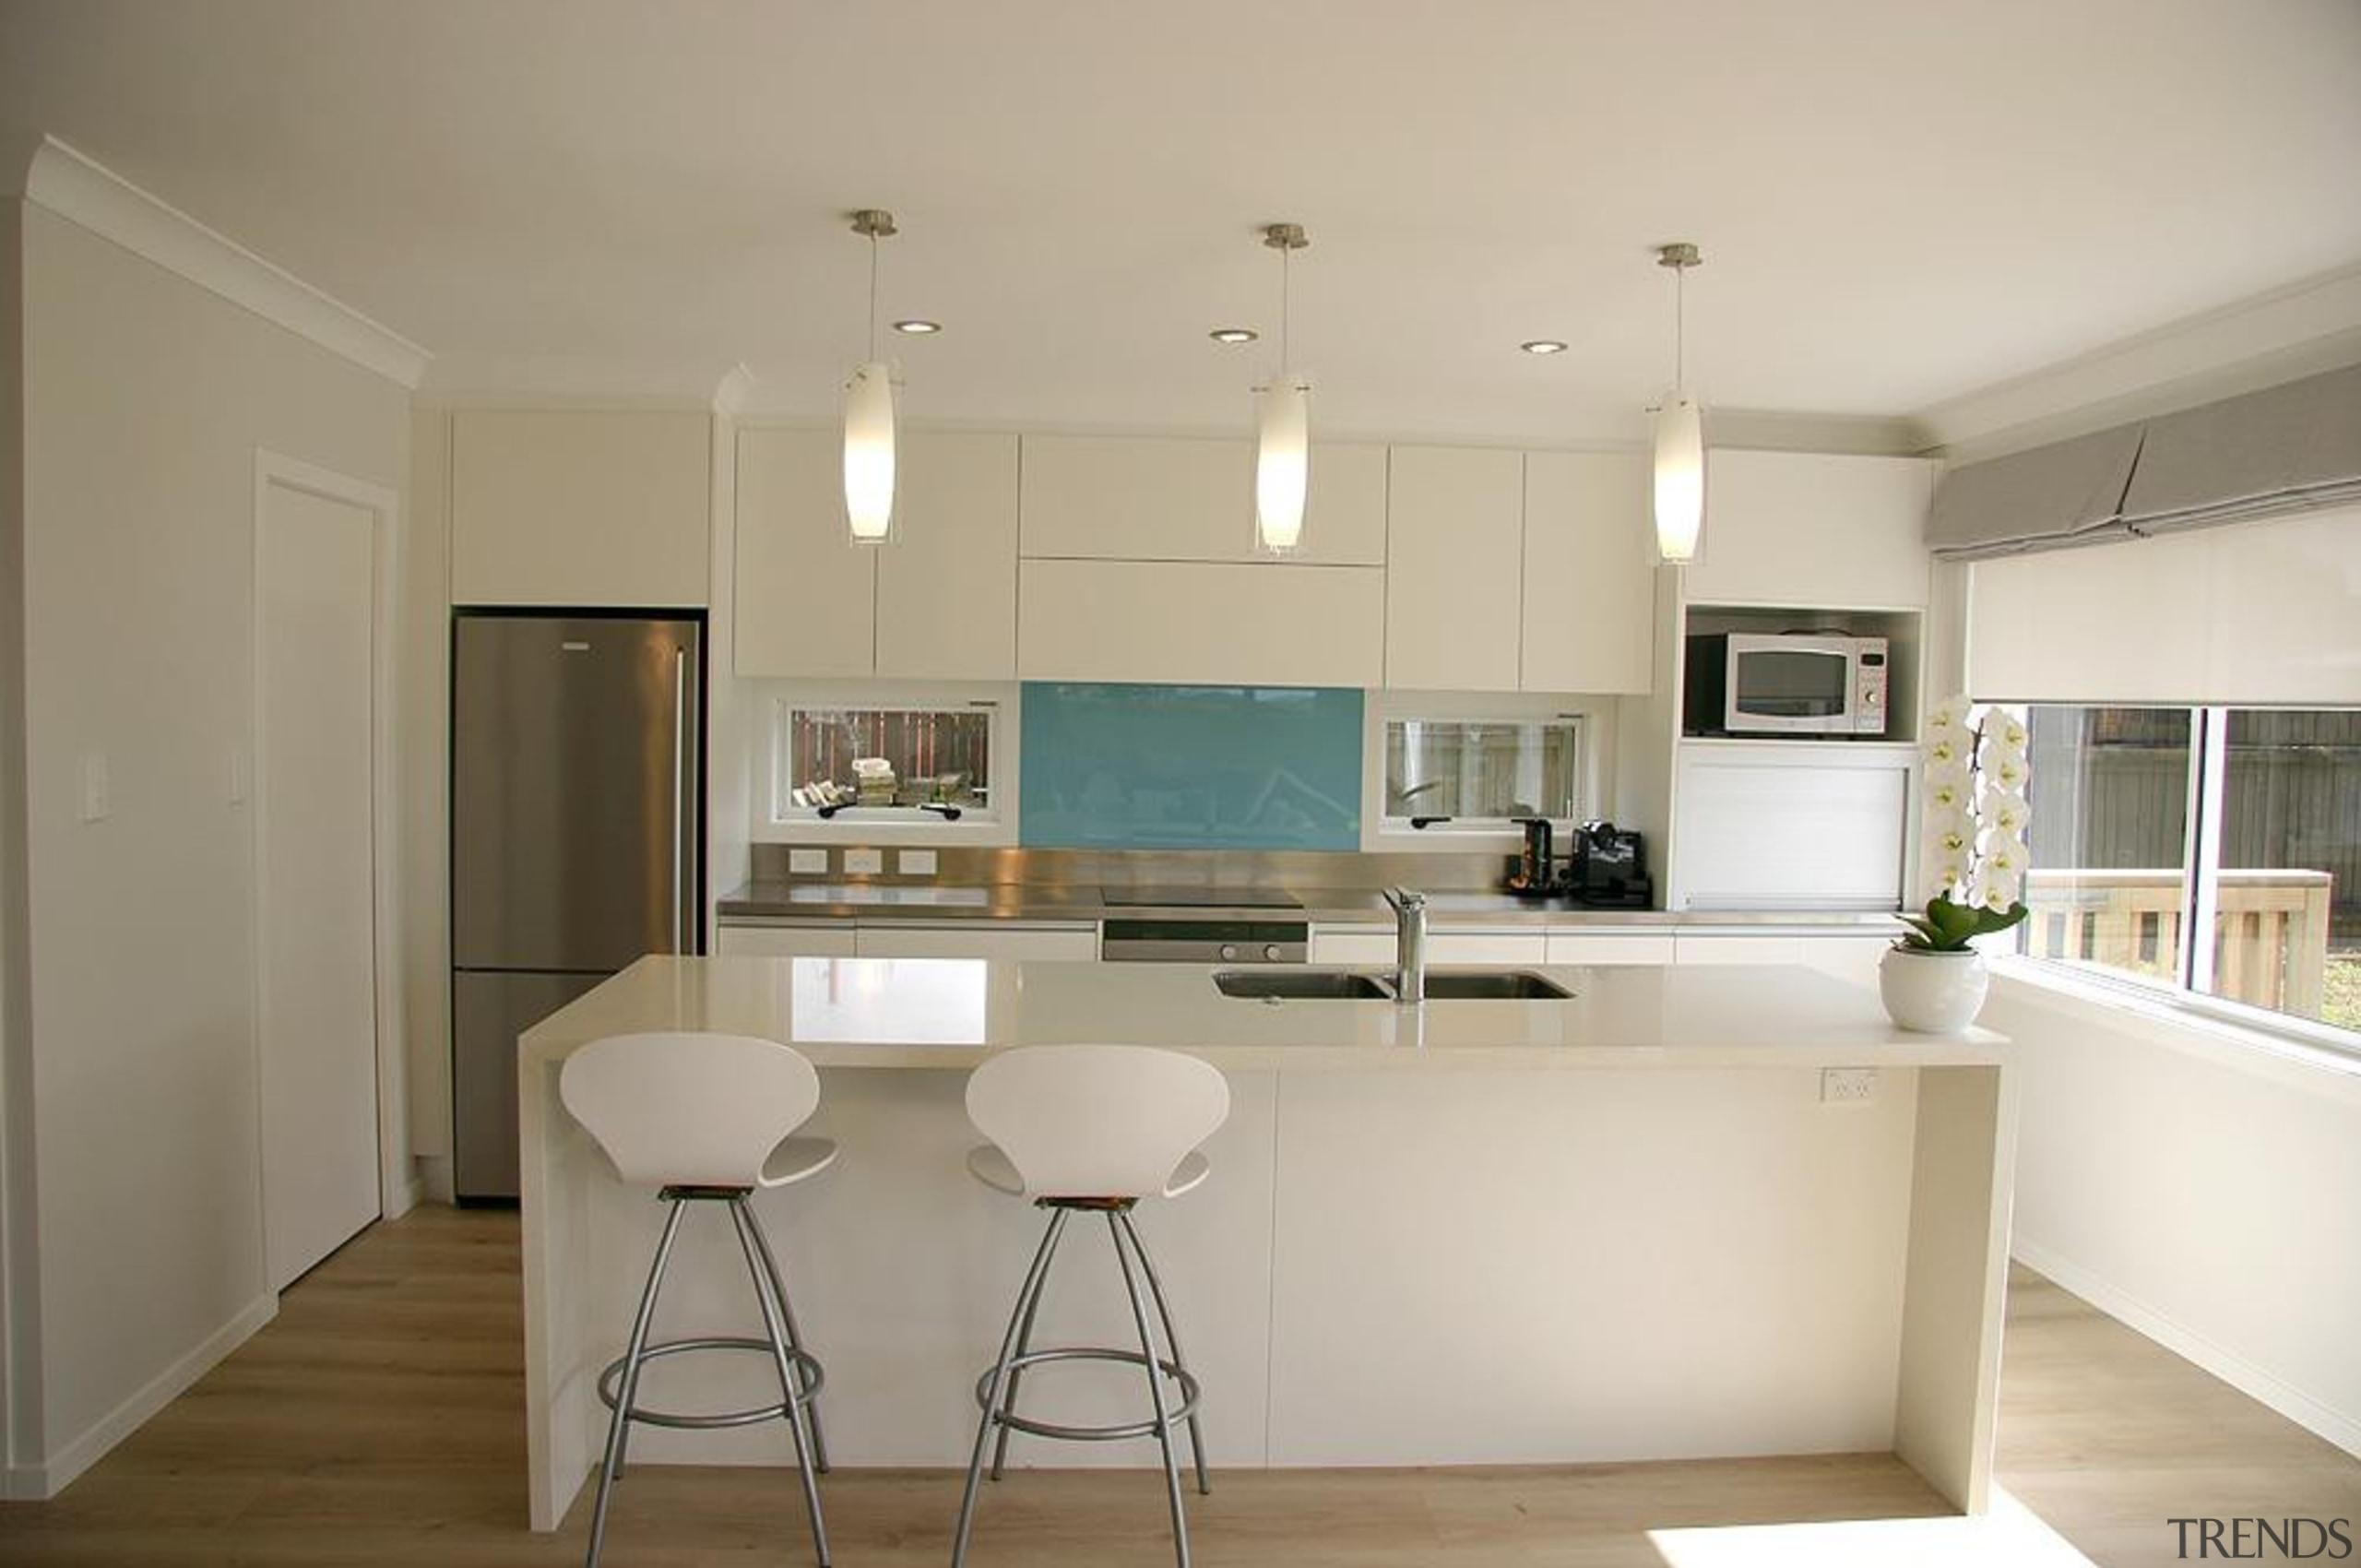 11 hillsborough modern 2013 3.jpg - 11_hillsborough_modern_2013_3.jpg - architecture, countertop, floor, interior design, kitchen, property, real estate, room, gray